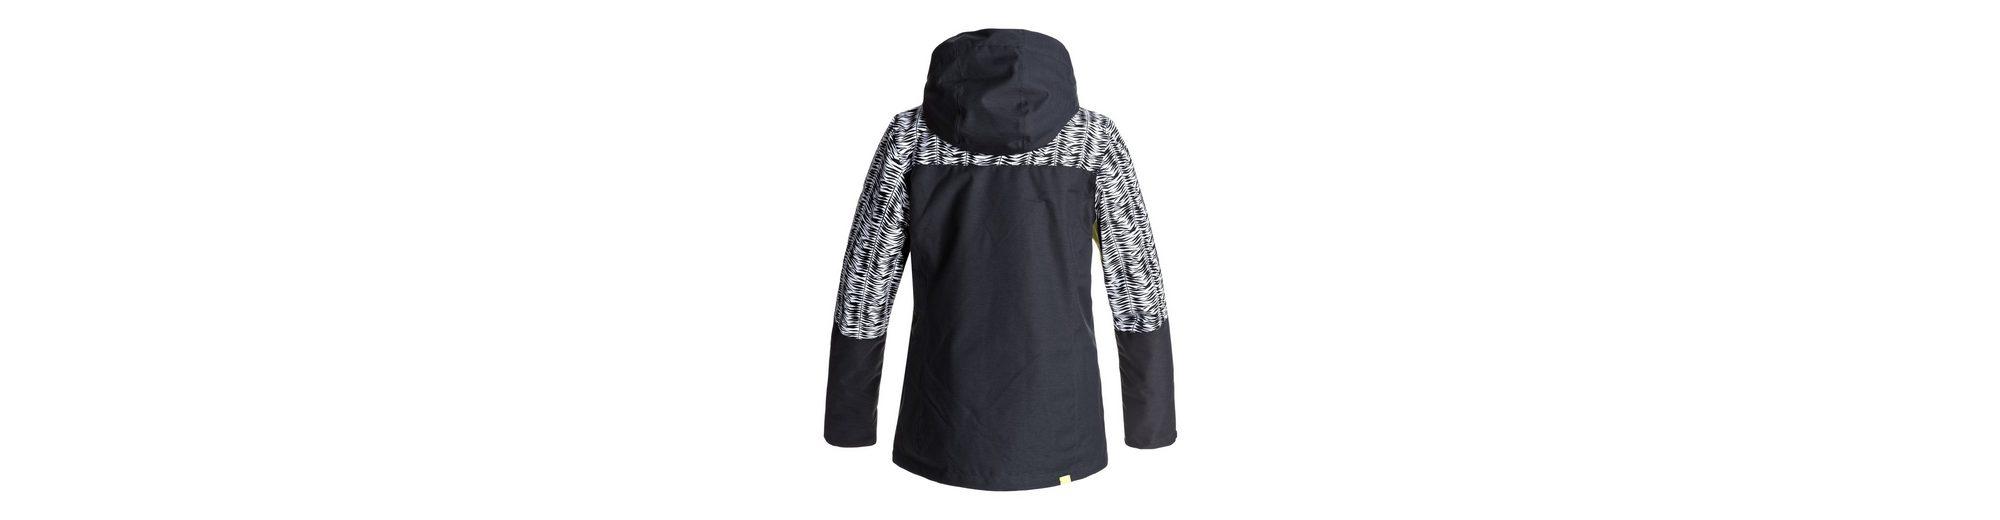 Roxy Snow Jacke ROXY Jetty Günstig Kaufen 2018 Unisex Online Günstig Online RVXc2VJ8